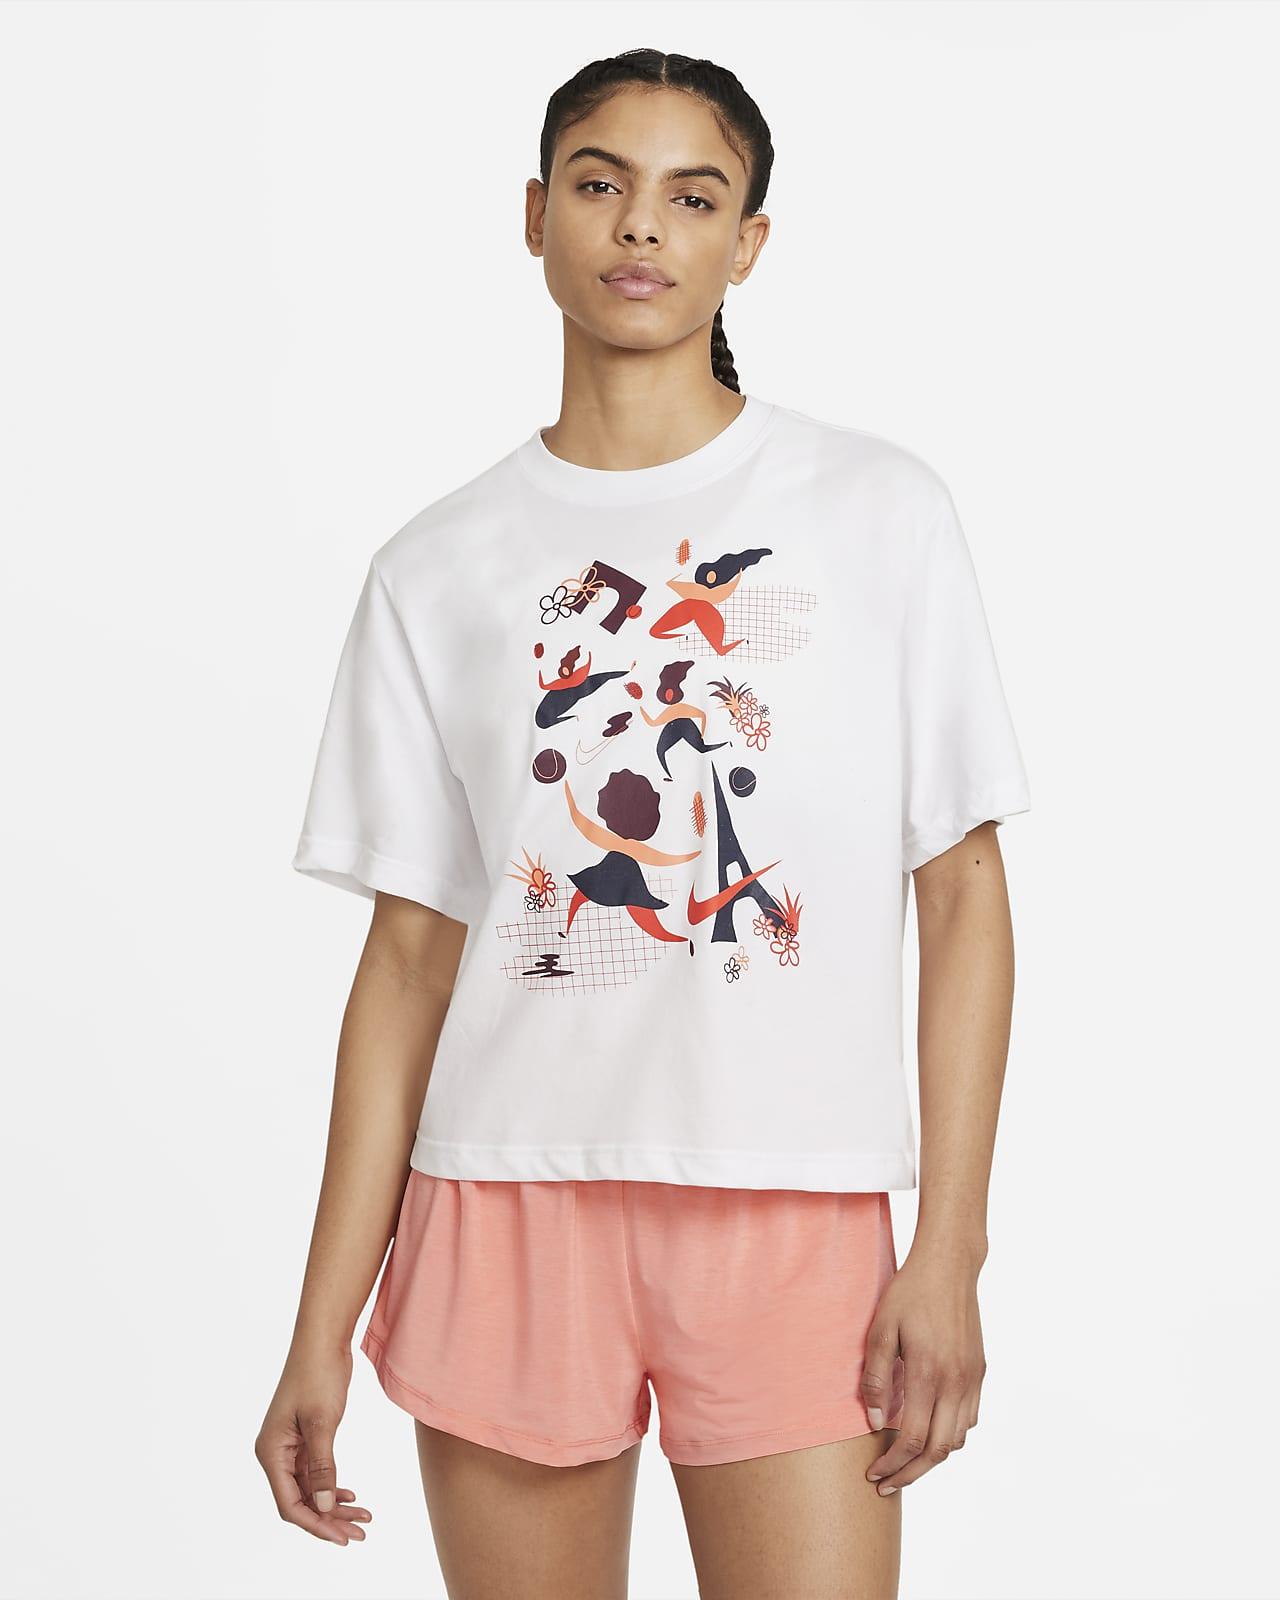 T-shirt de ténis NikeCourt Dri-FIT para mulher